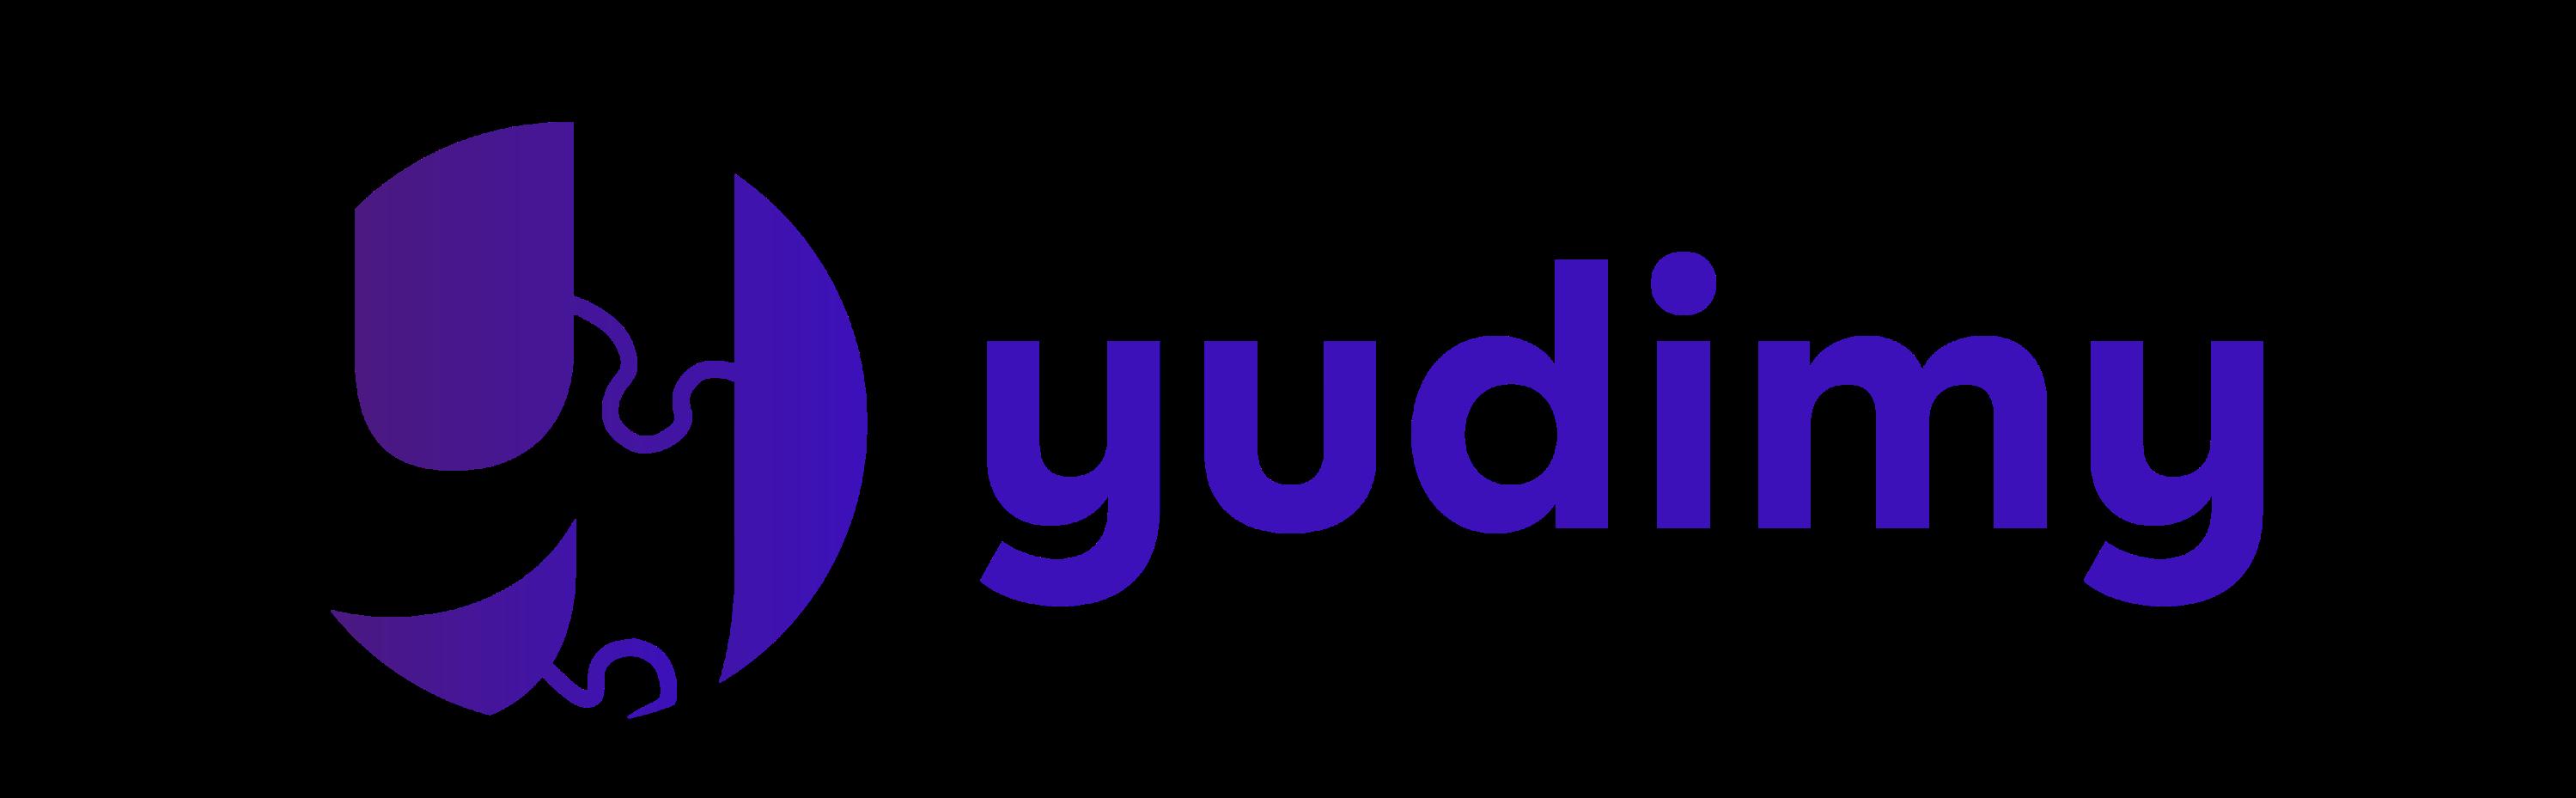 yudimy%20horizontal%20logo%20_edited.png